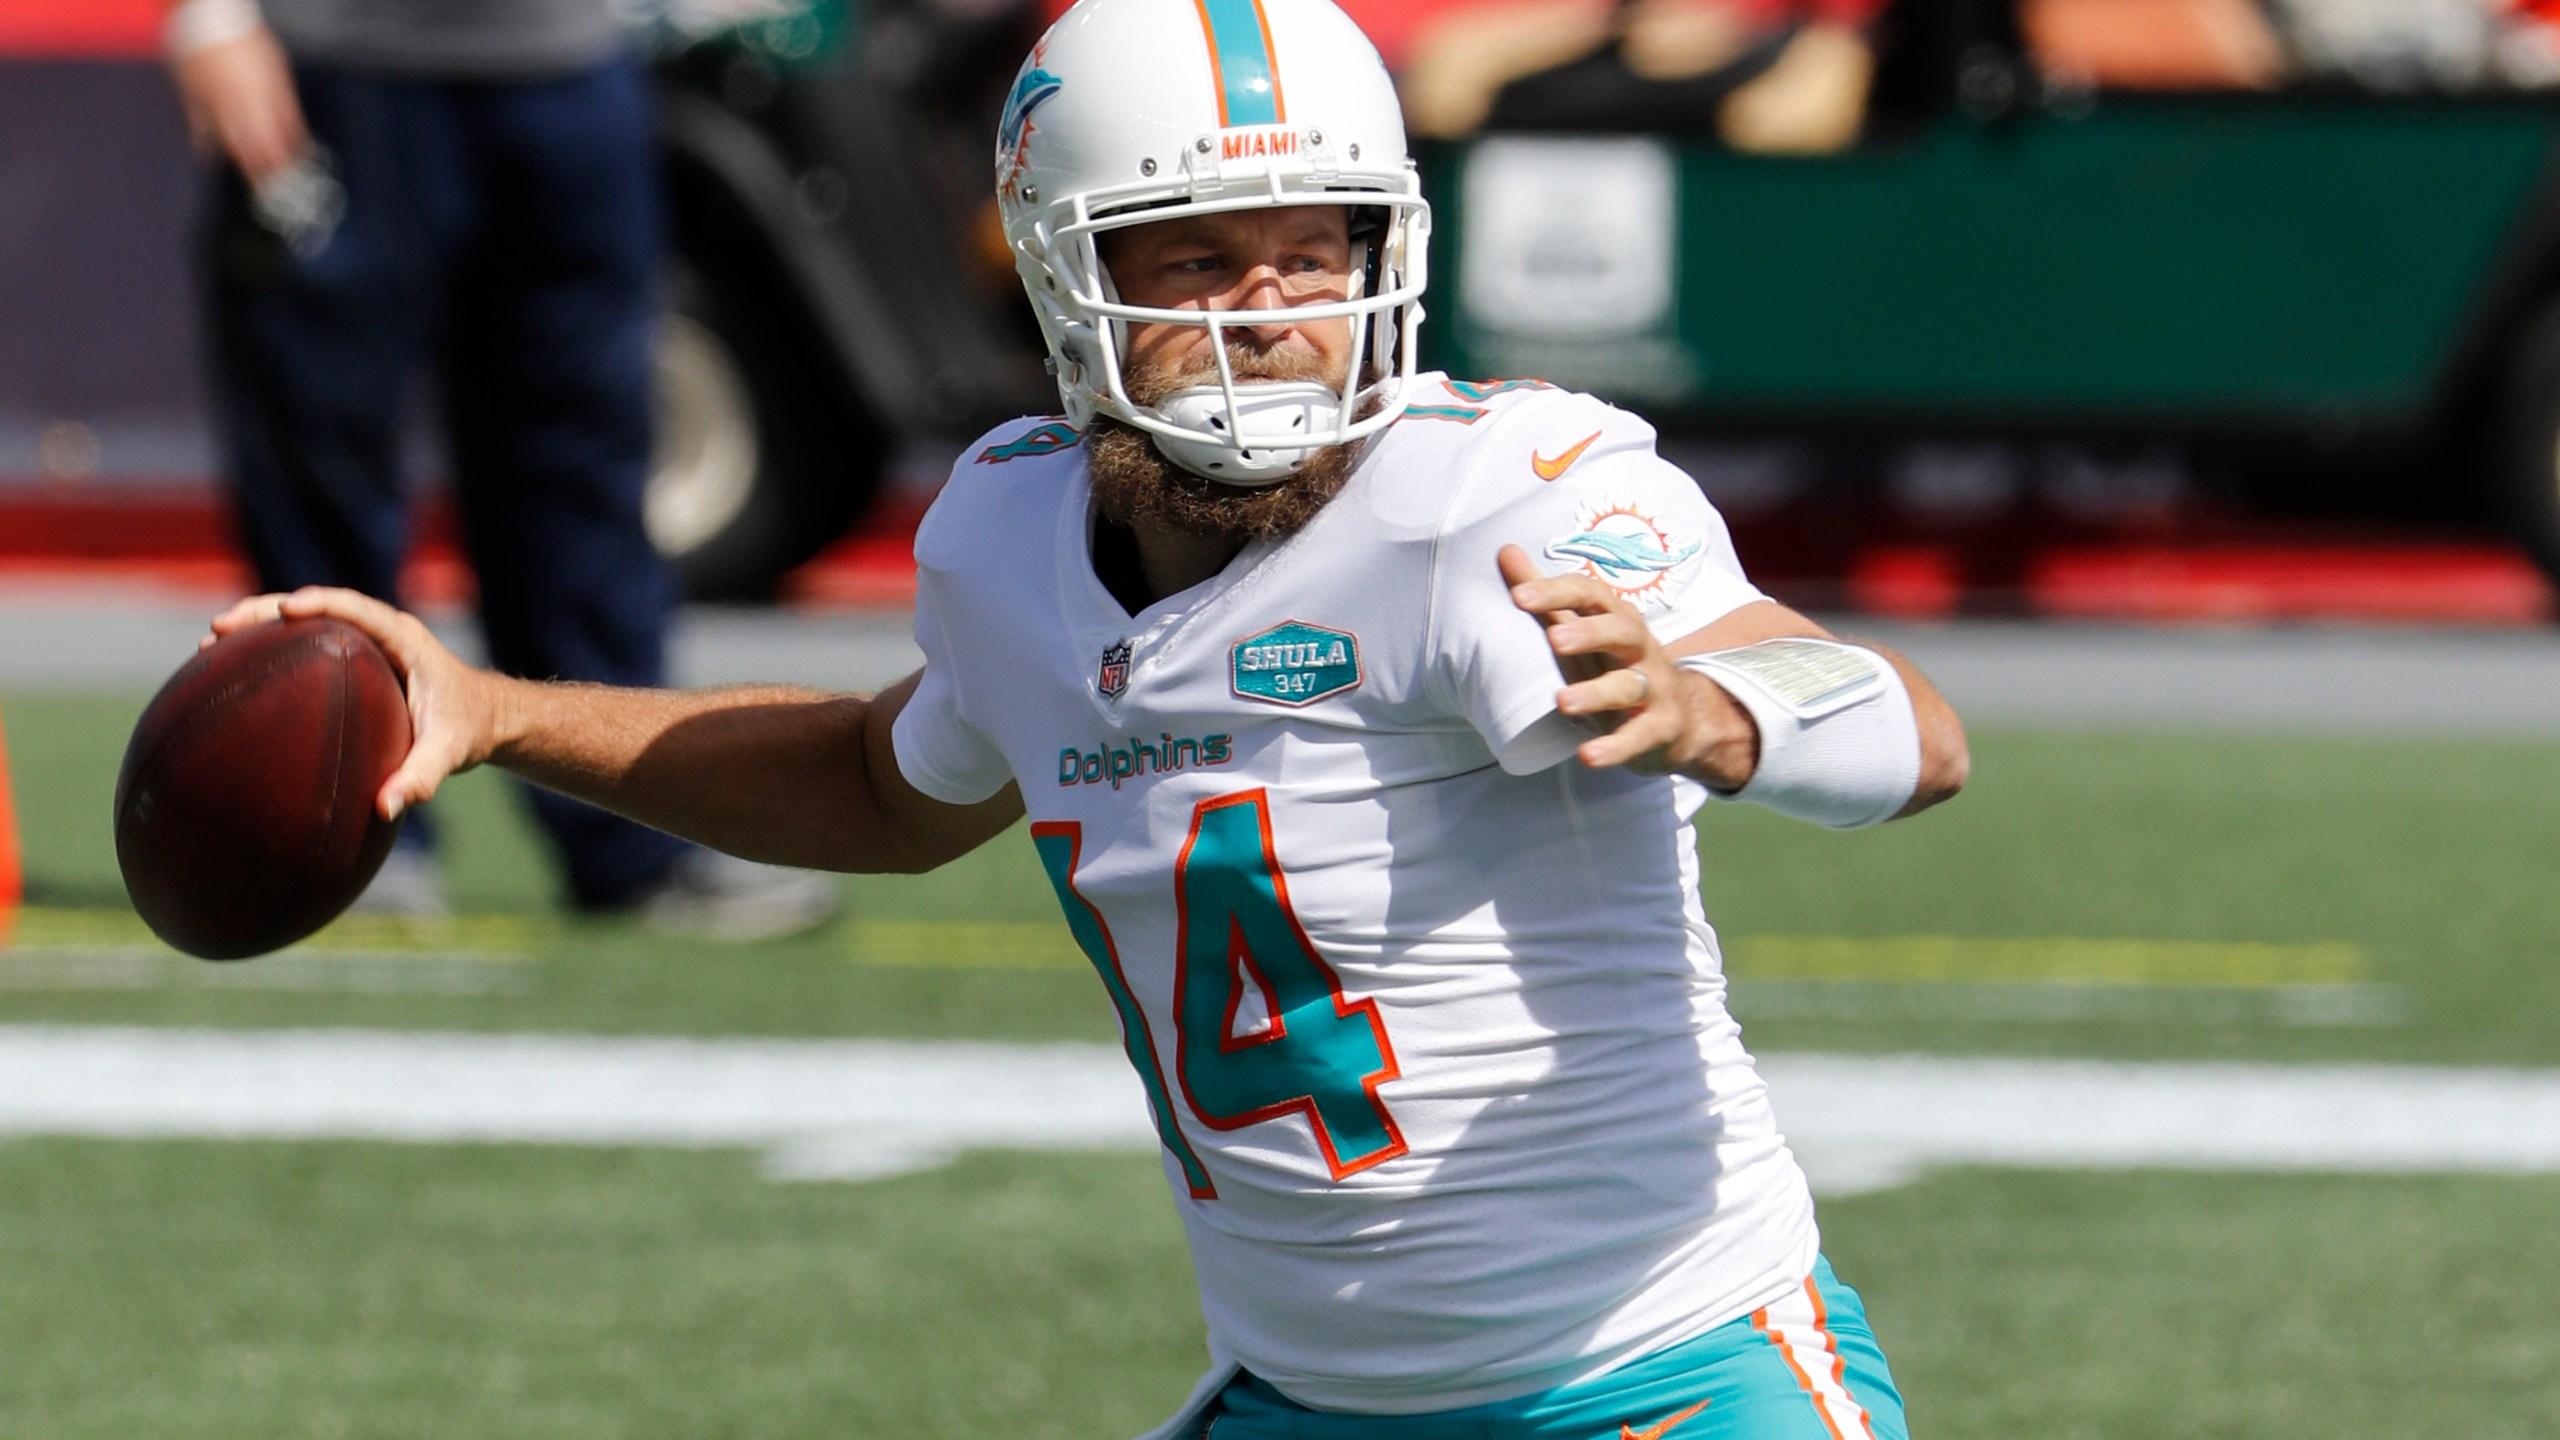 Patriots QB rumors: Ryan Fitzpatrick says hes open to